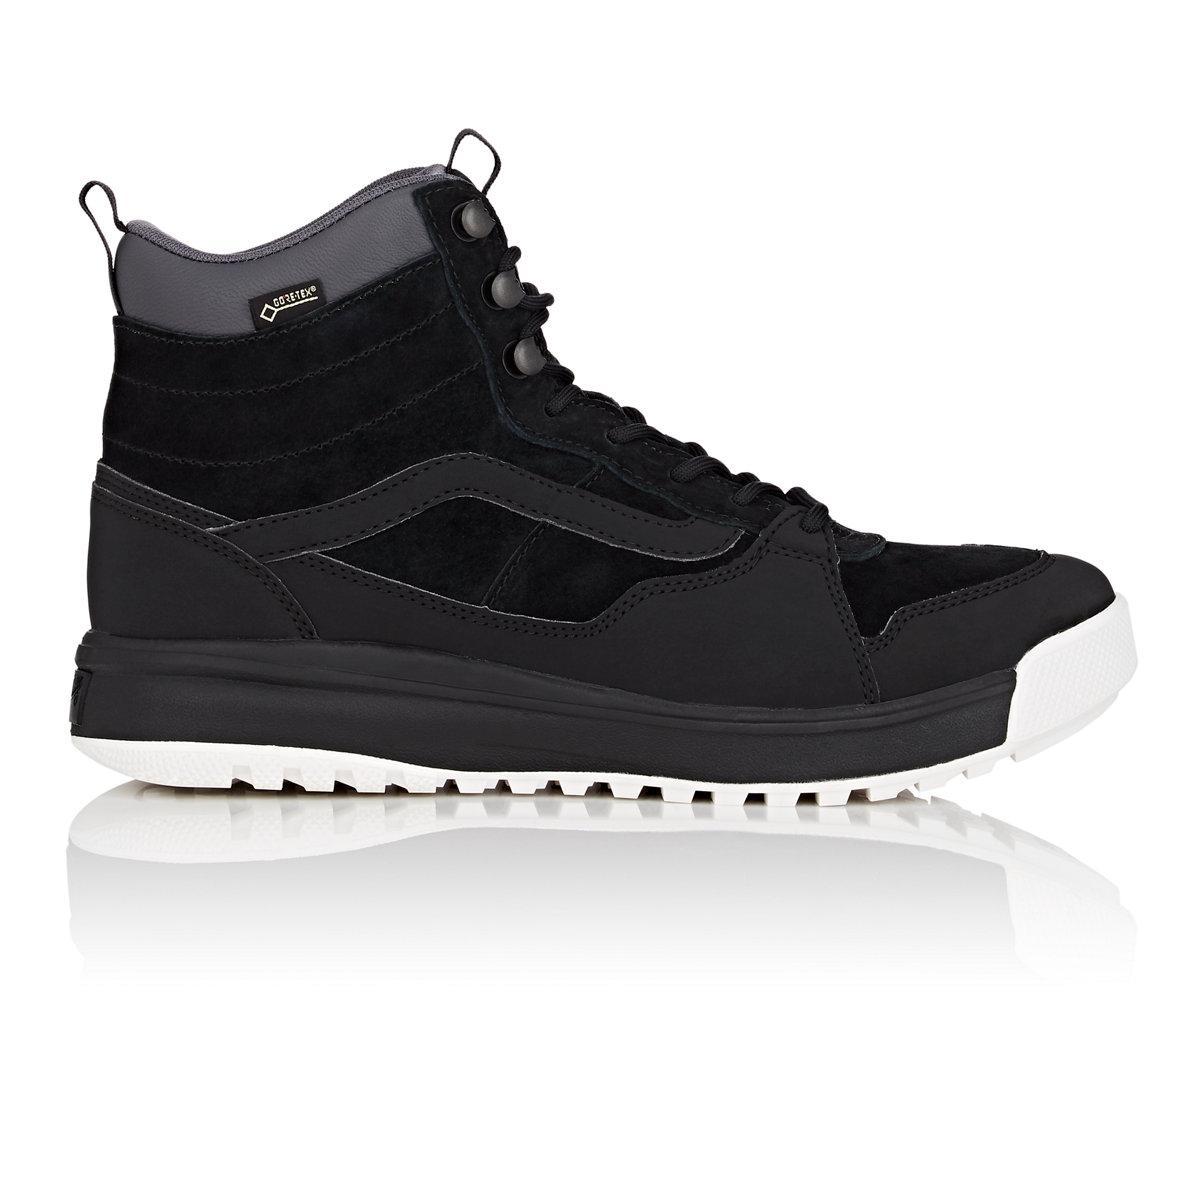 1f60442f5dc Lyst - Vans Ultrarange Hi Mte Boots in Black for Men